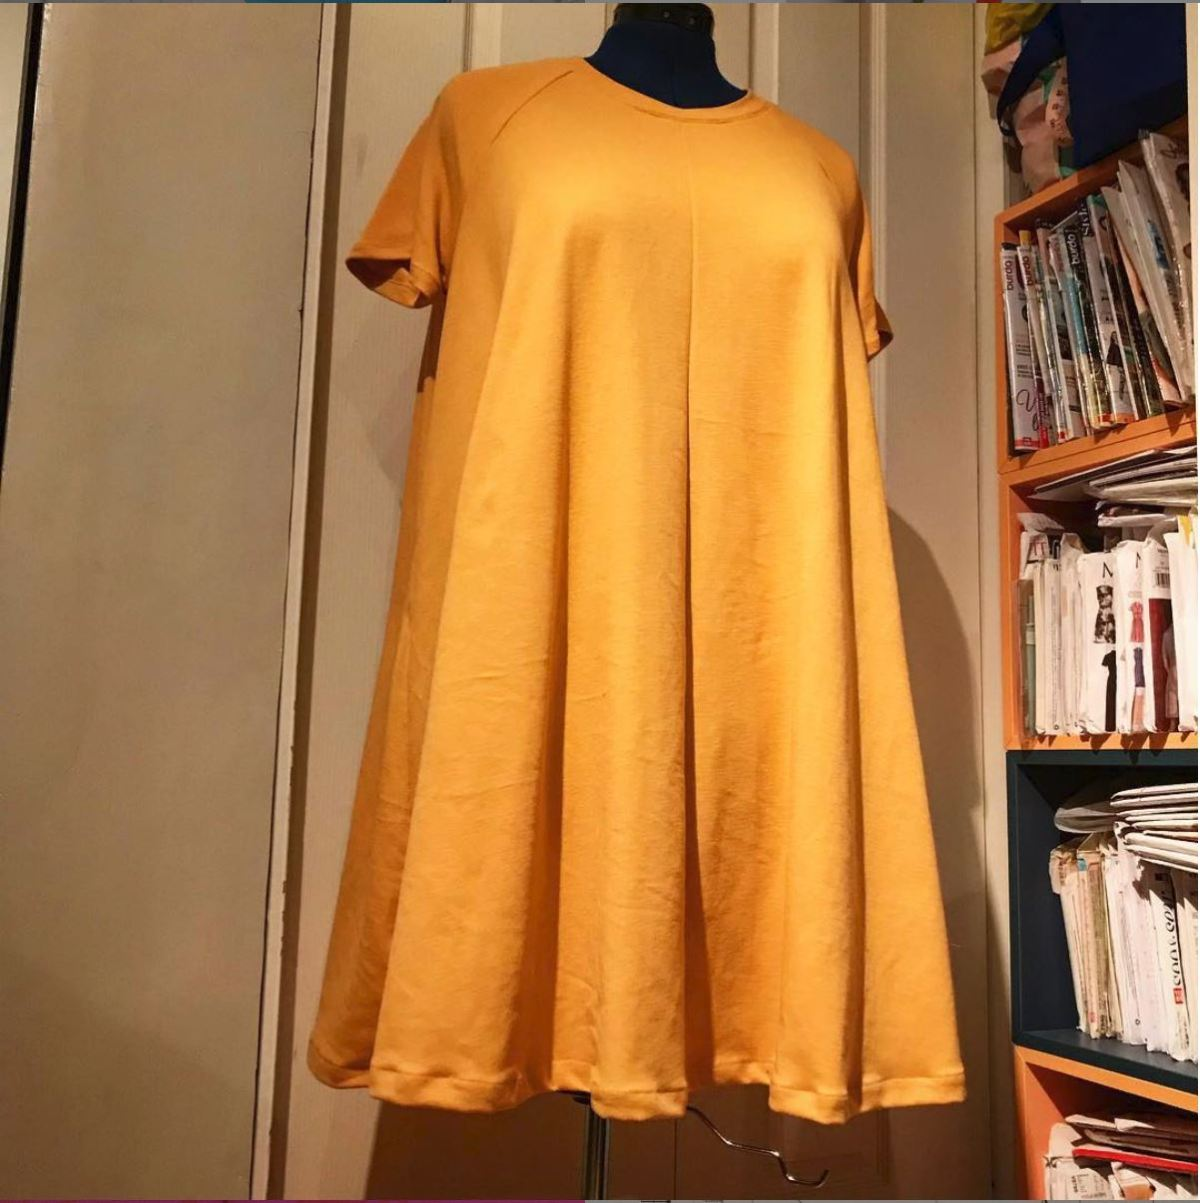 Vibrant yellow dress